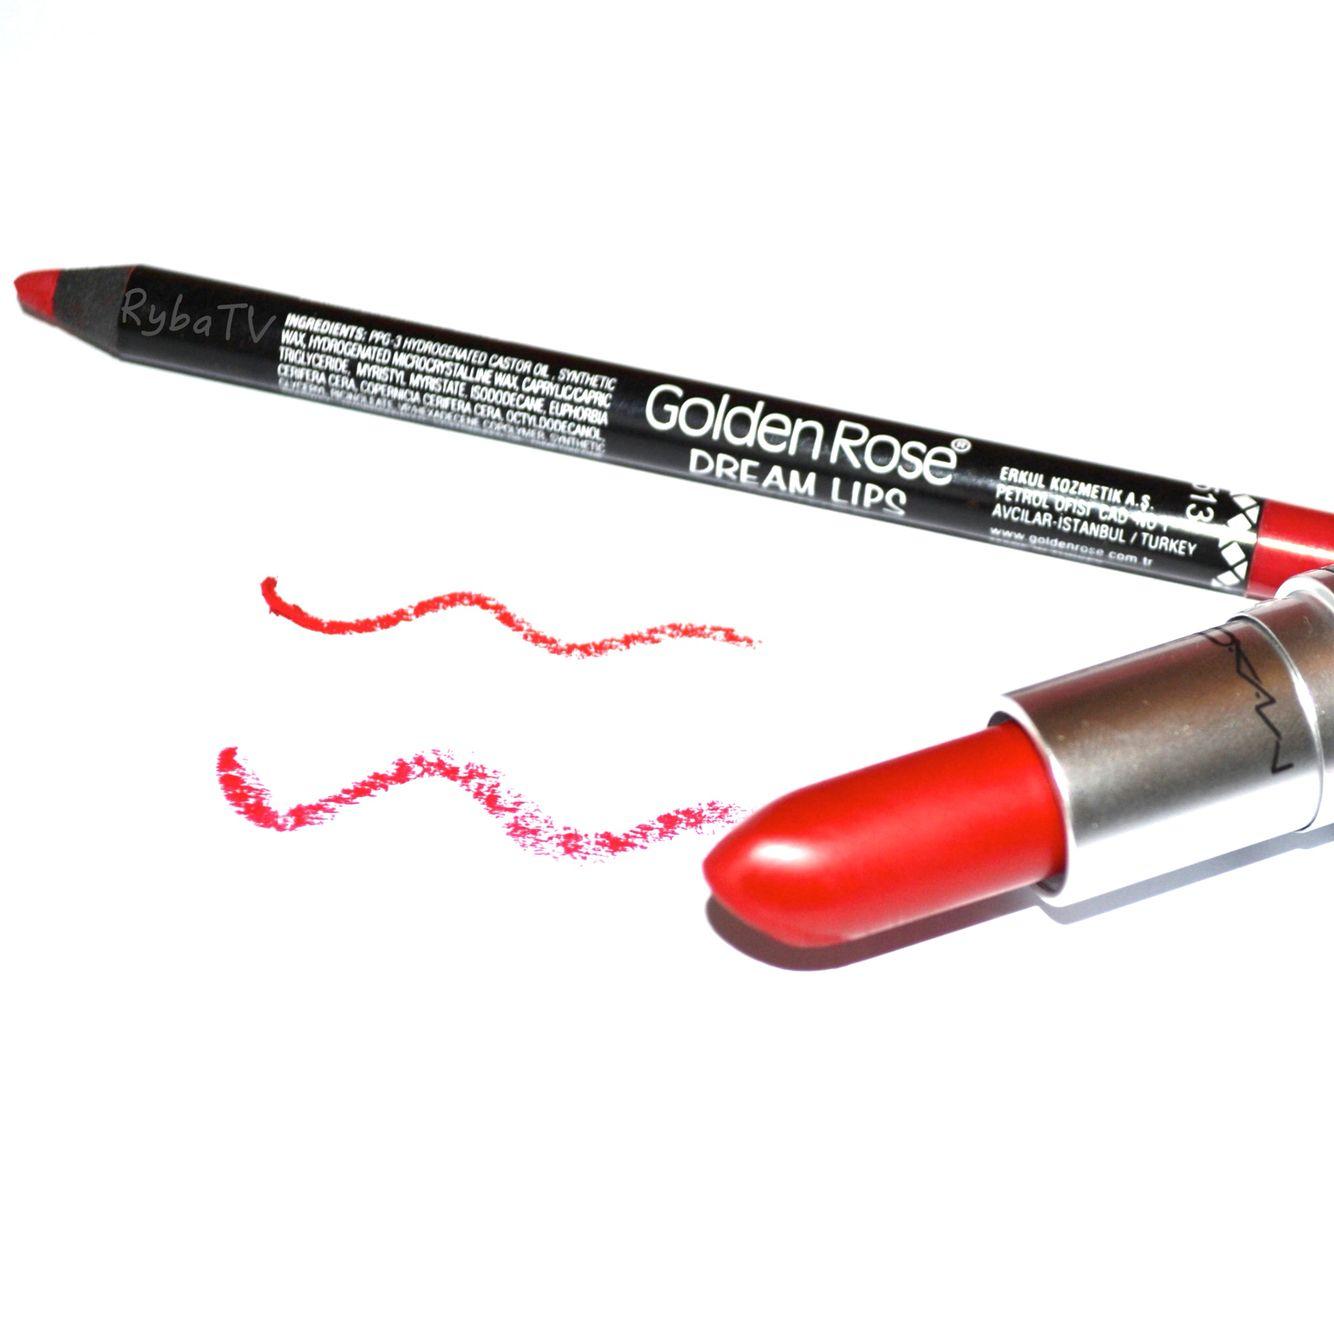 Mac Cosmetics Lipstick Blue Under Tone Ruby Woo Golden Rose 513 Lip